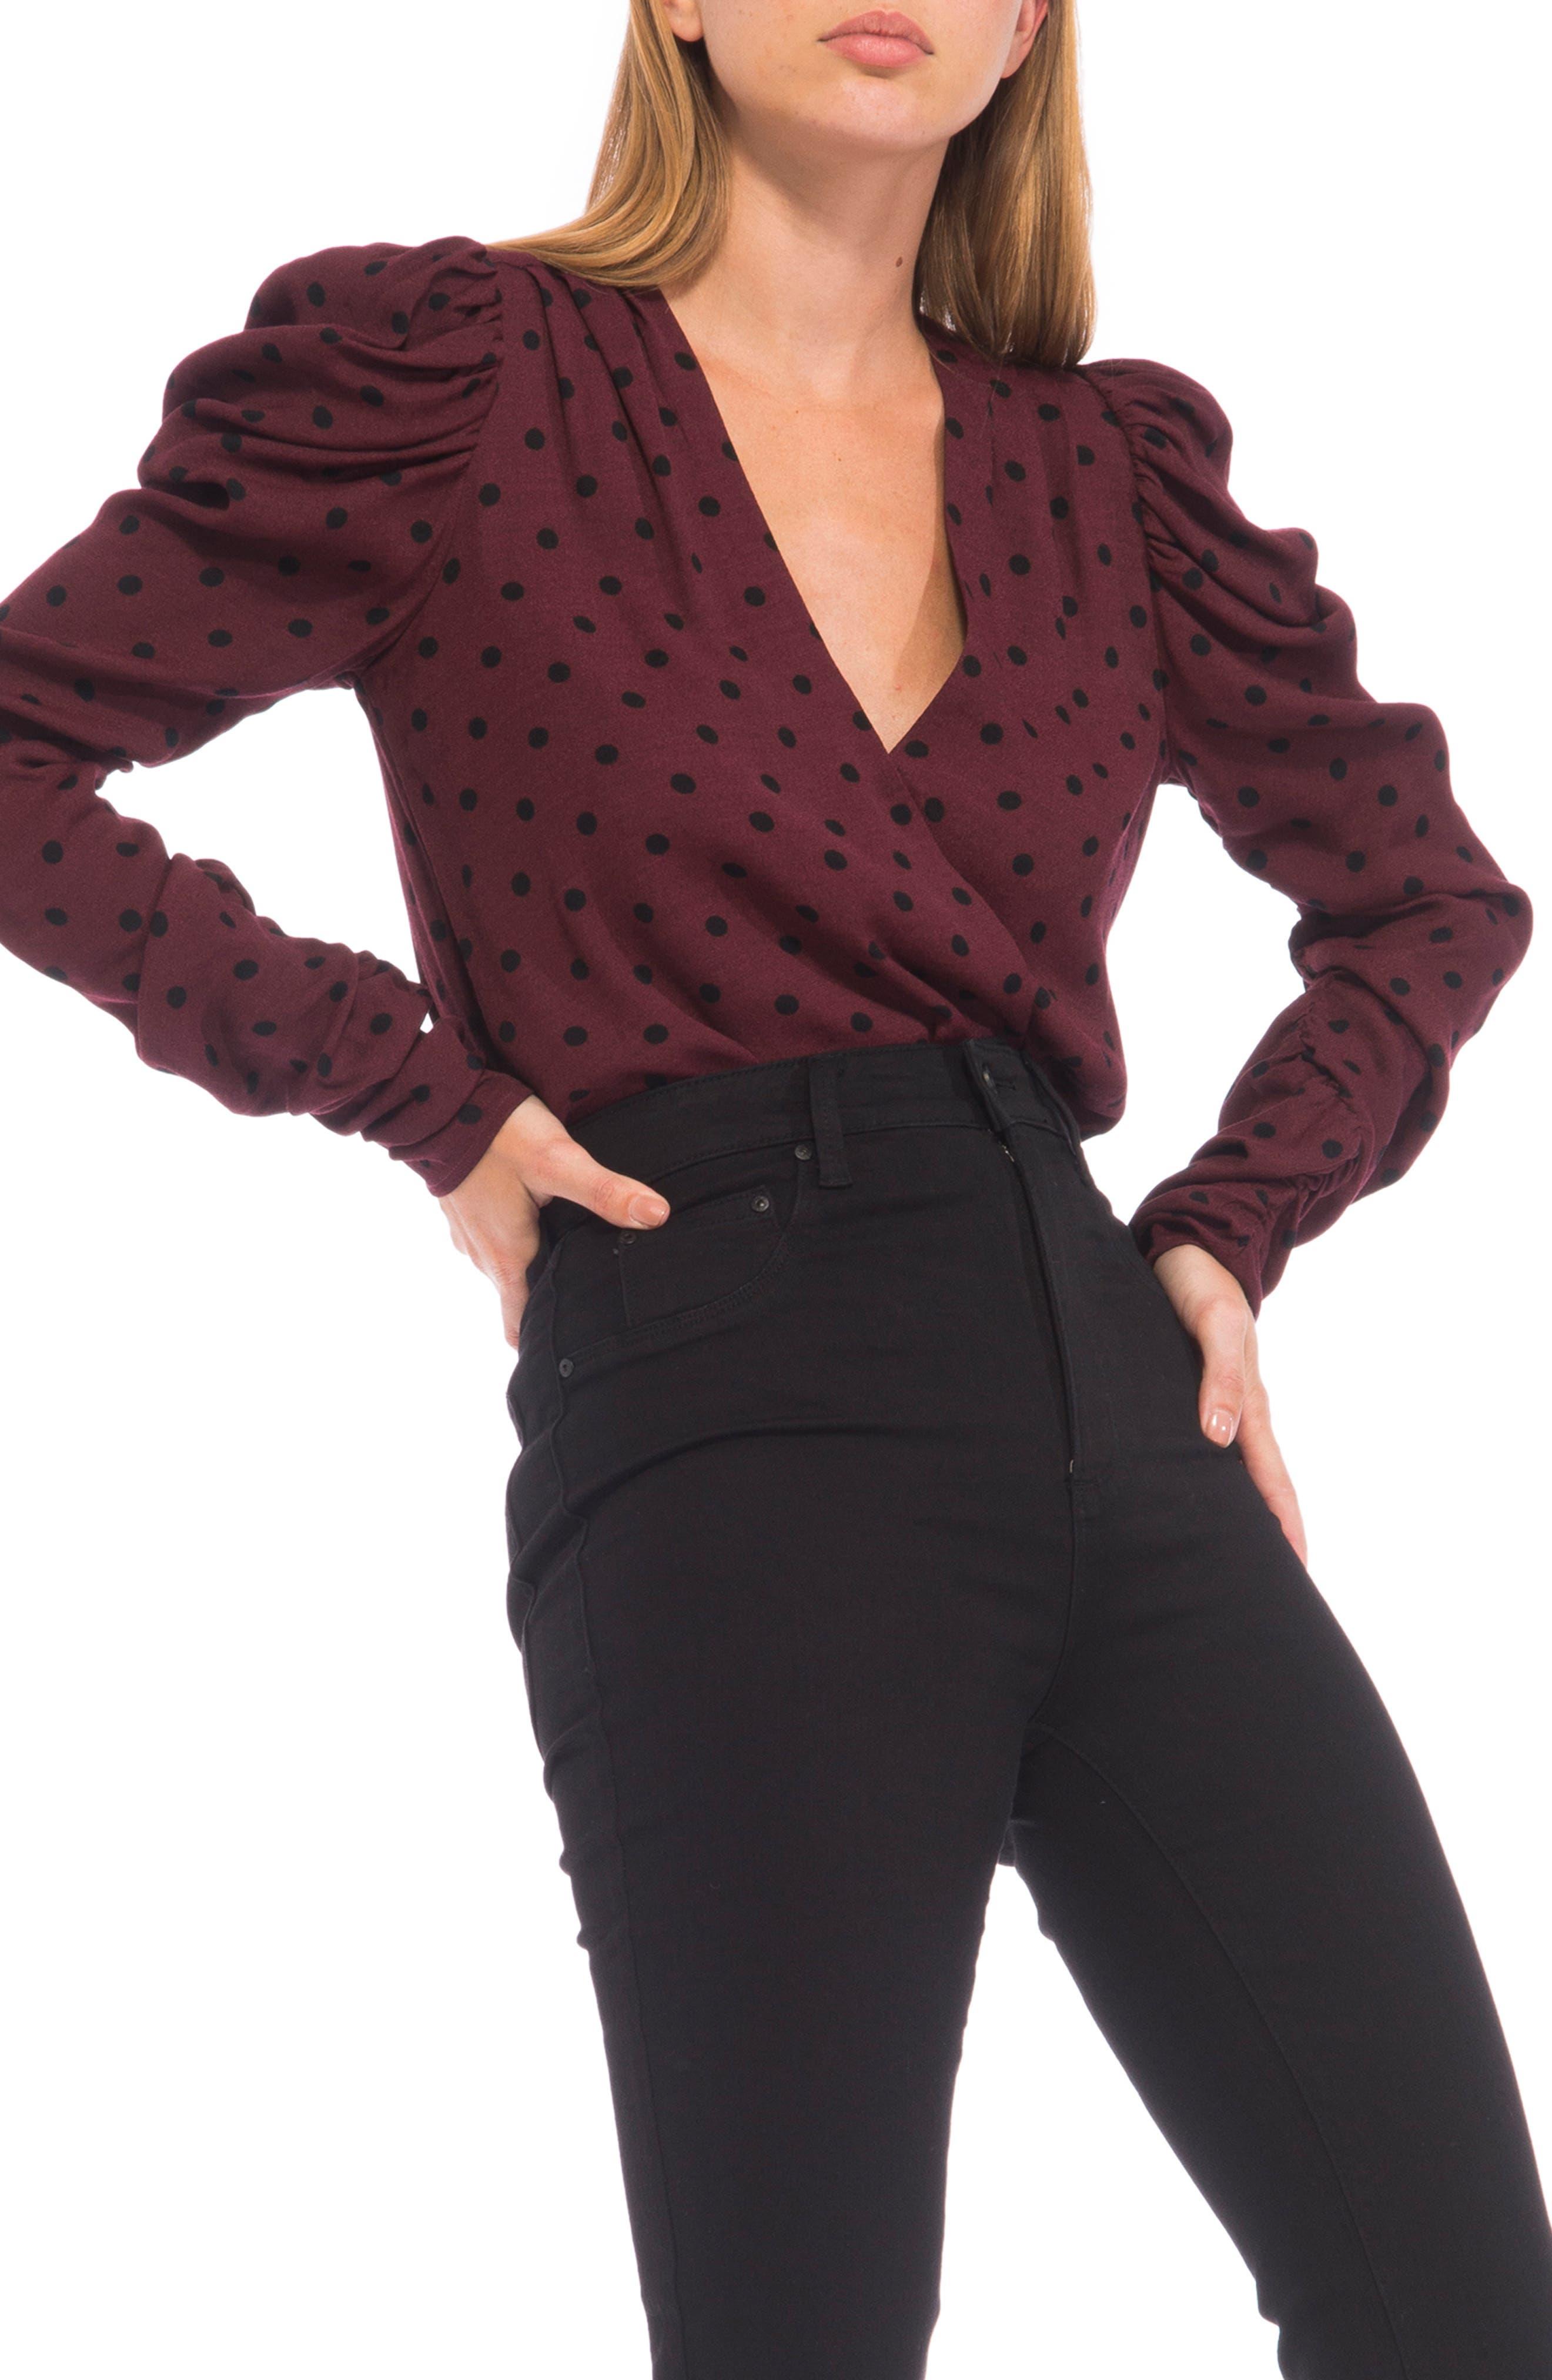 Danna Puff Long Sleeve Bodysuit